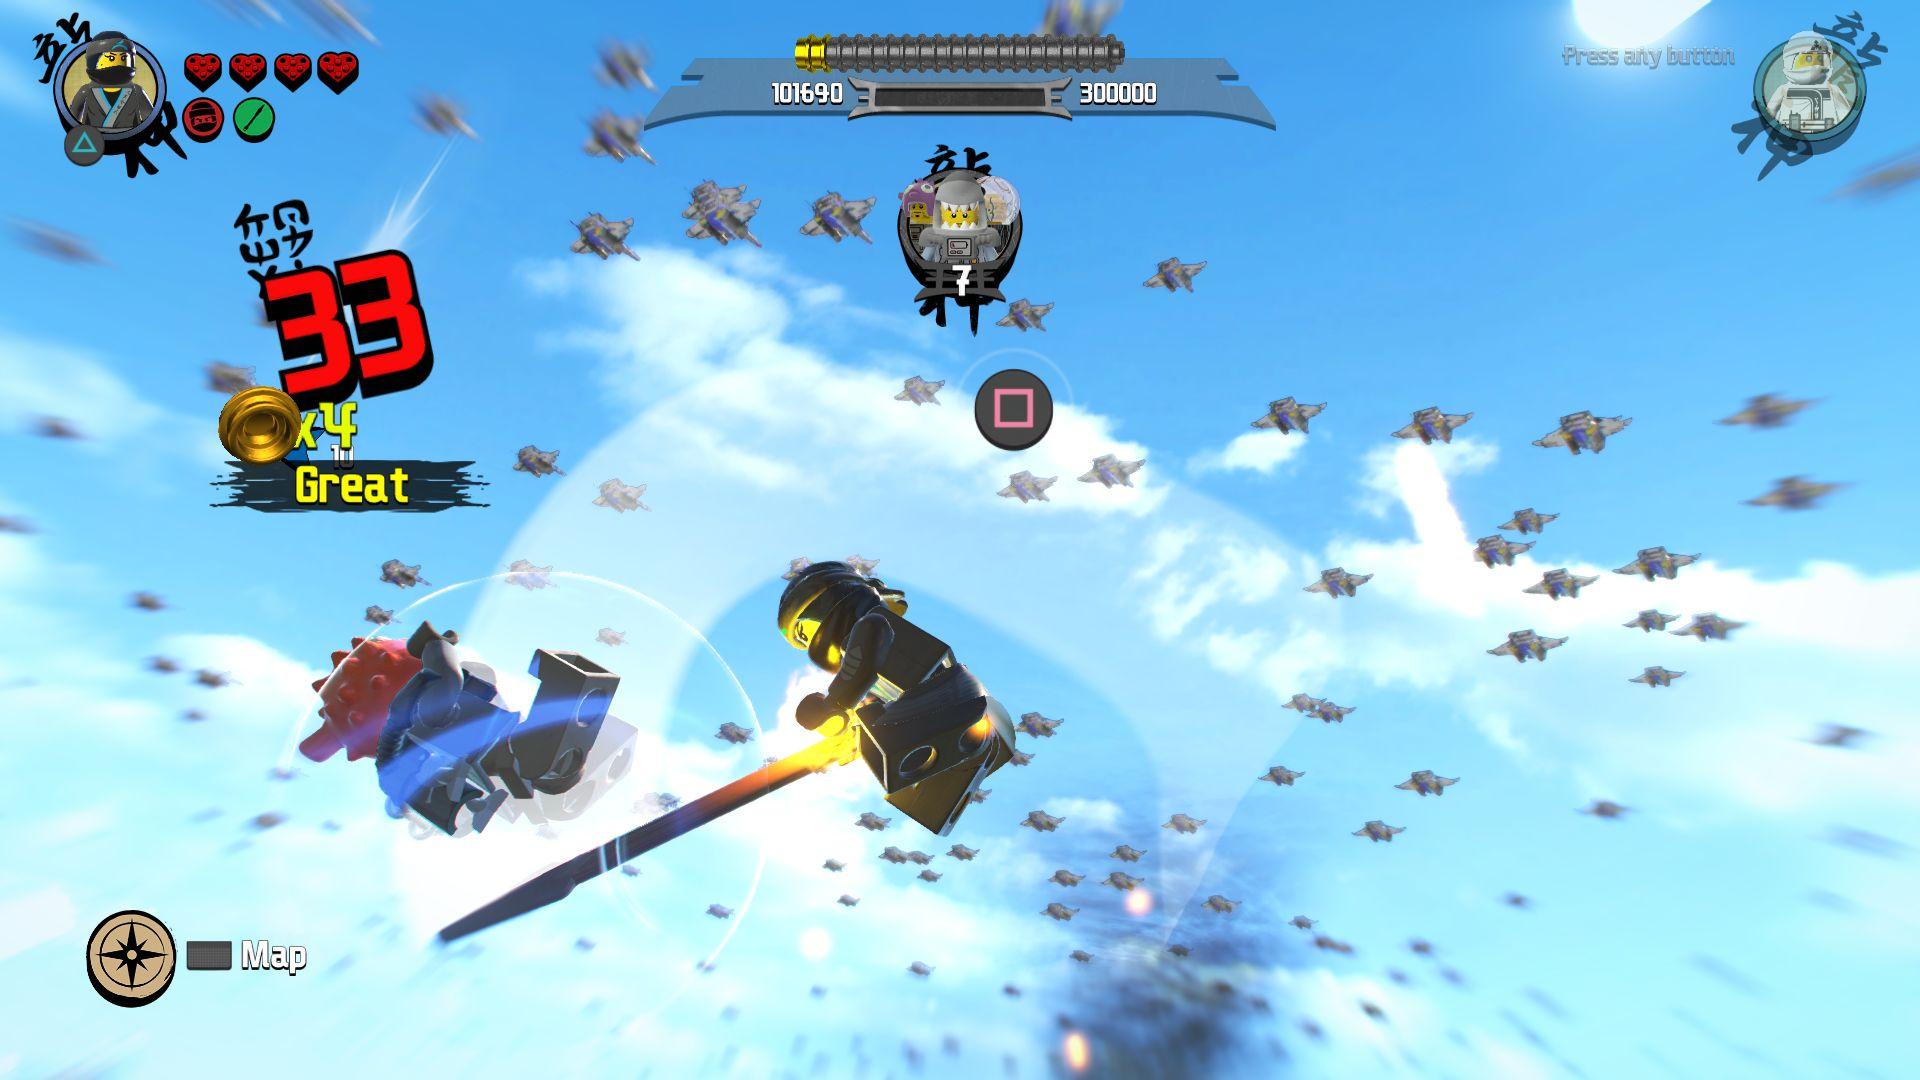 LEGO Ninjago Movie Video Game - jak se legáček nindžou stal 151105